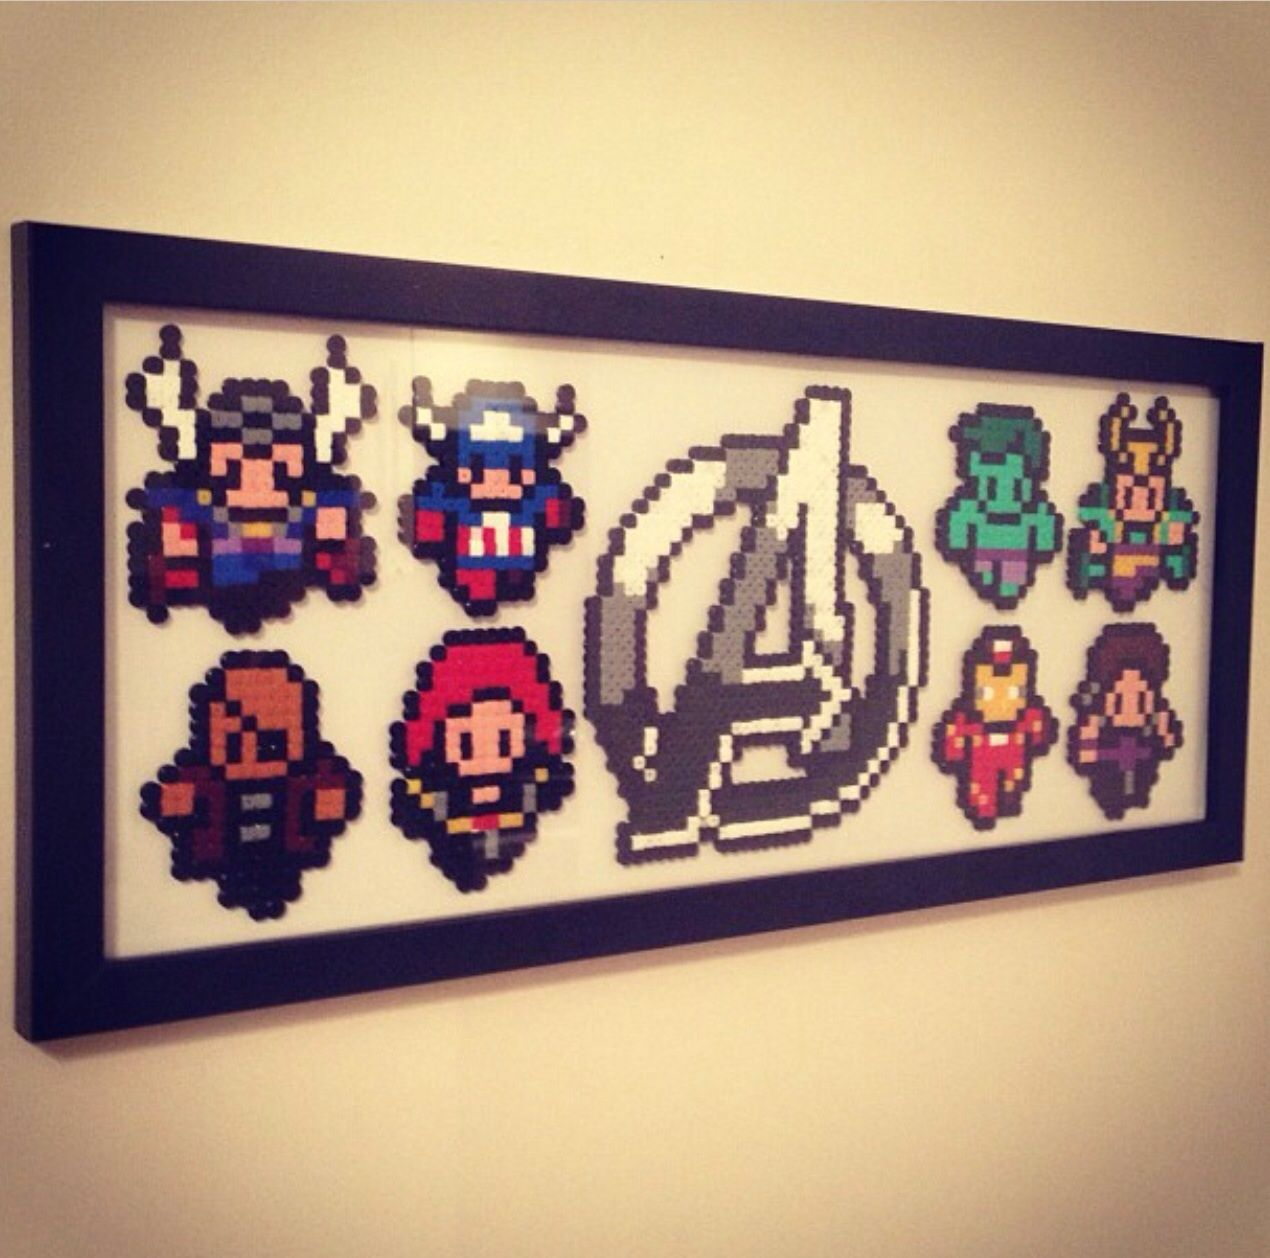 Avengers hama beads by PBoy-UK on deviantART | Perler Bead Crafts ...